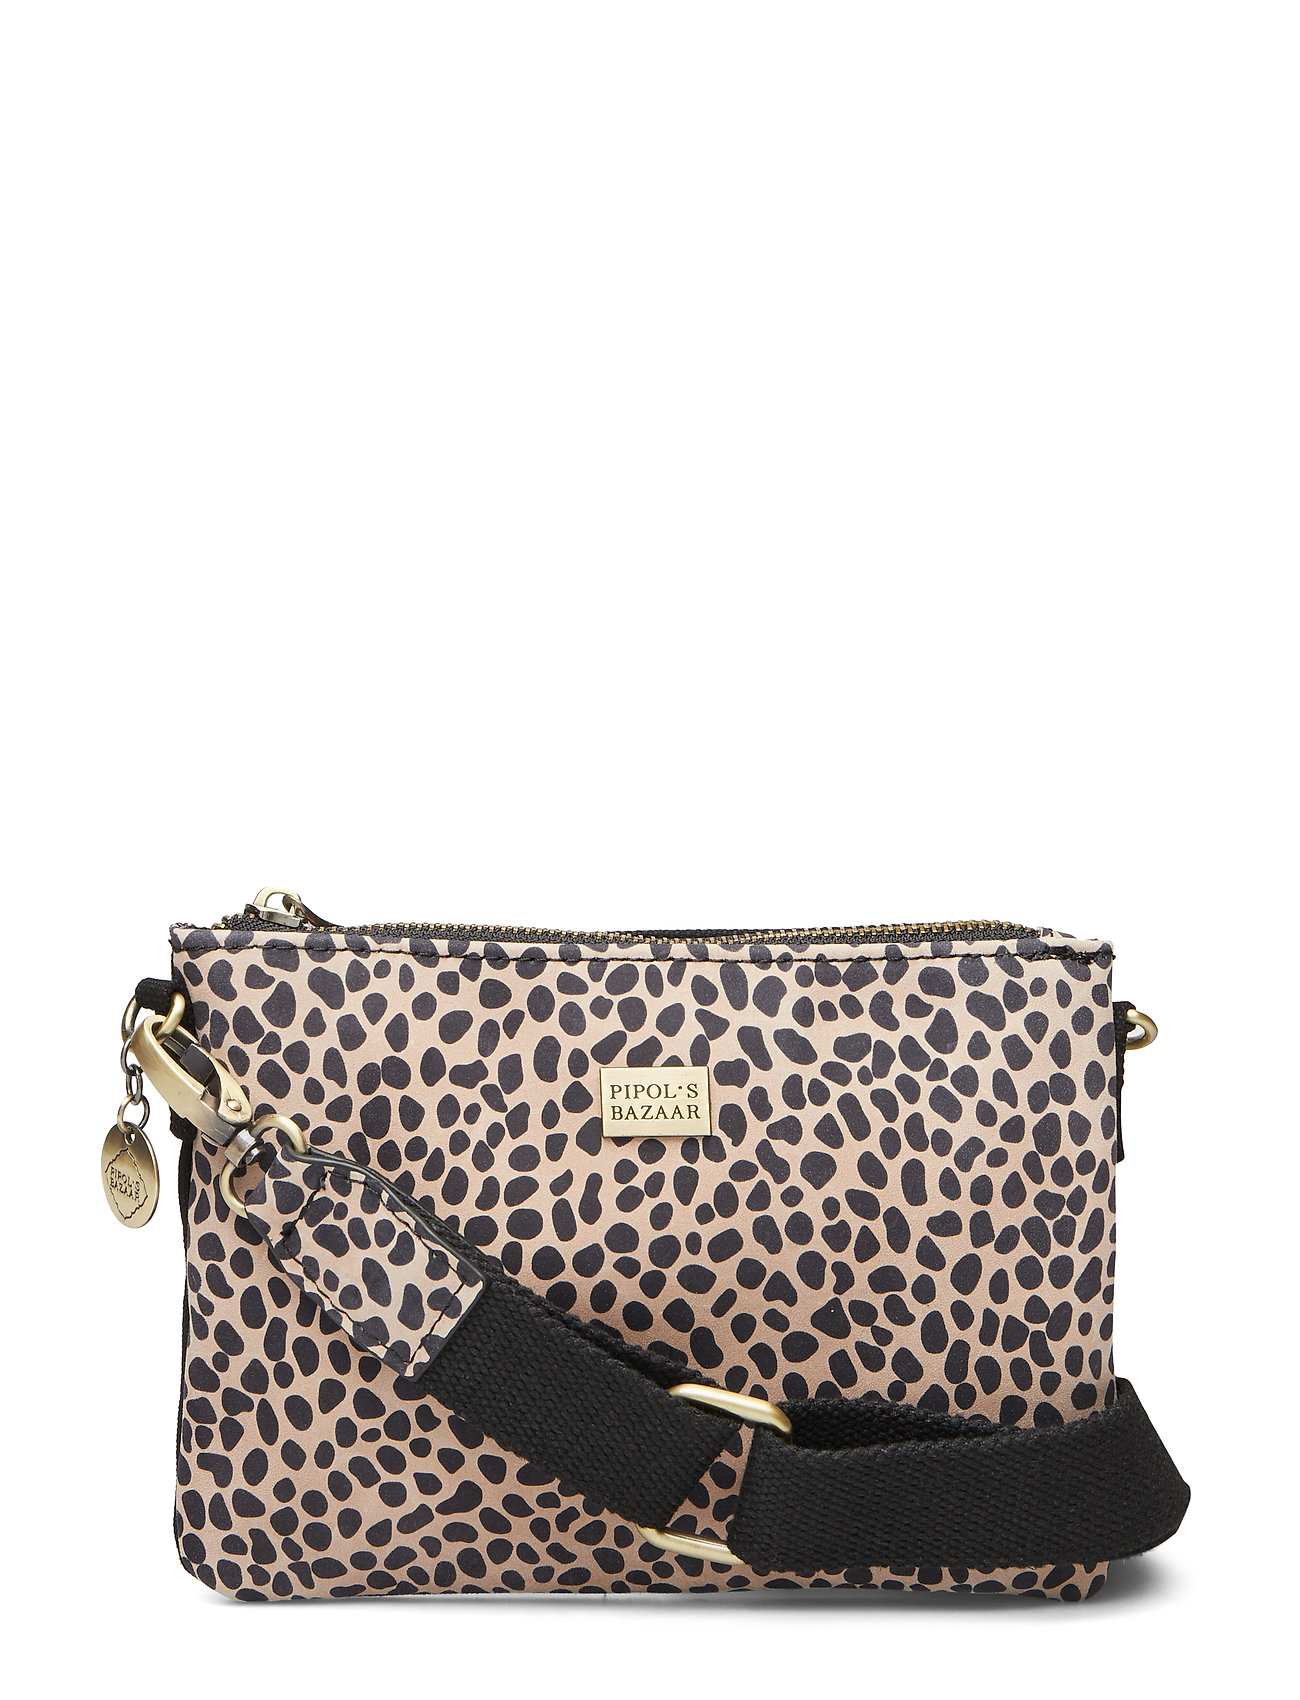 Bazaar Mini DotbrownPipol's Cross Leather Sweet Pipol´s Bag F1JKcl